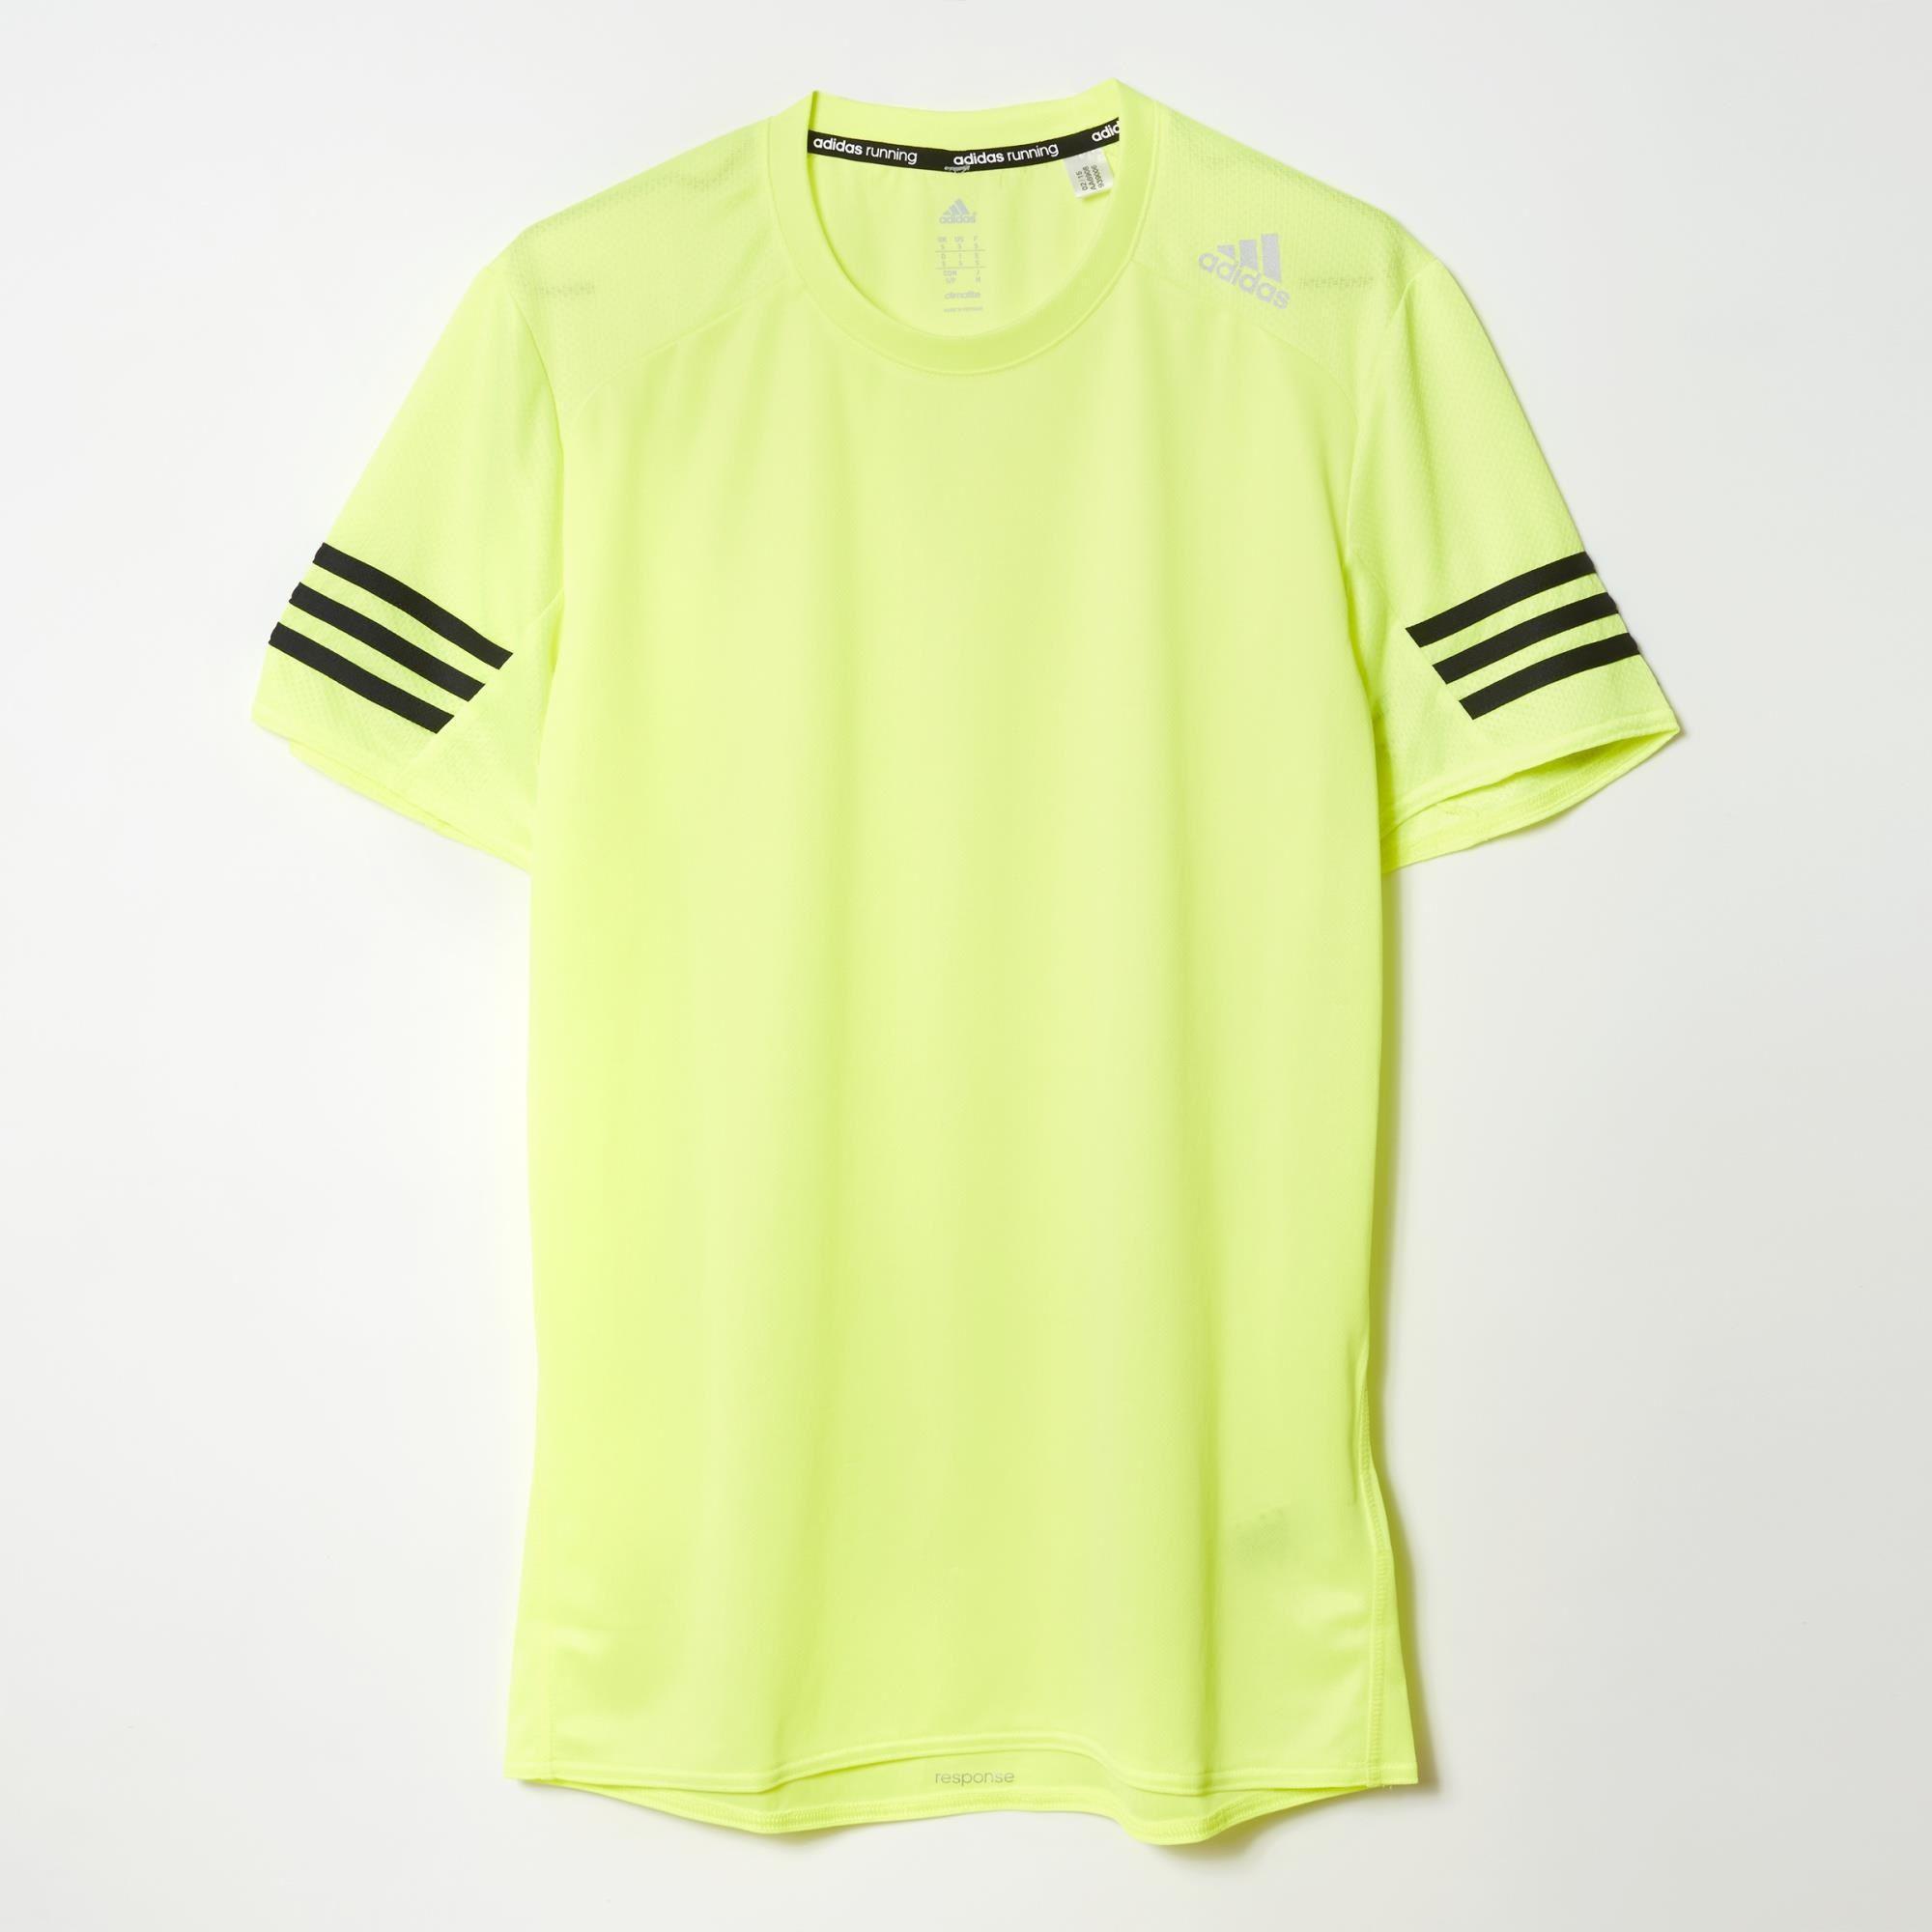 bdf39cecbca6 Adidas Mens Response Short Sleeve Tee - Solar Yellow - Tennisnuts.com